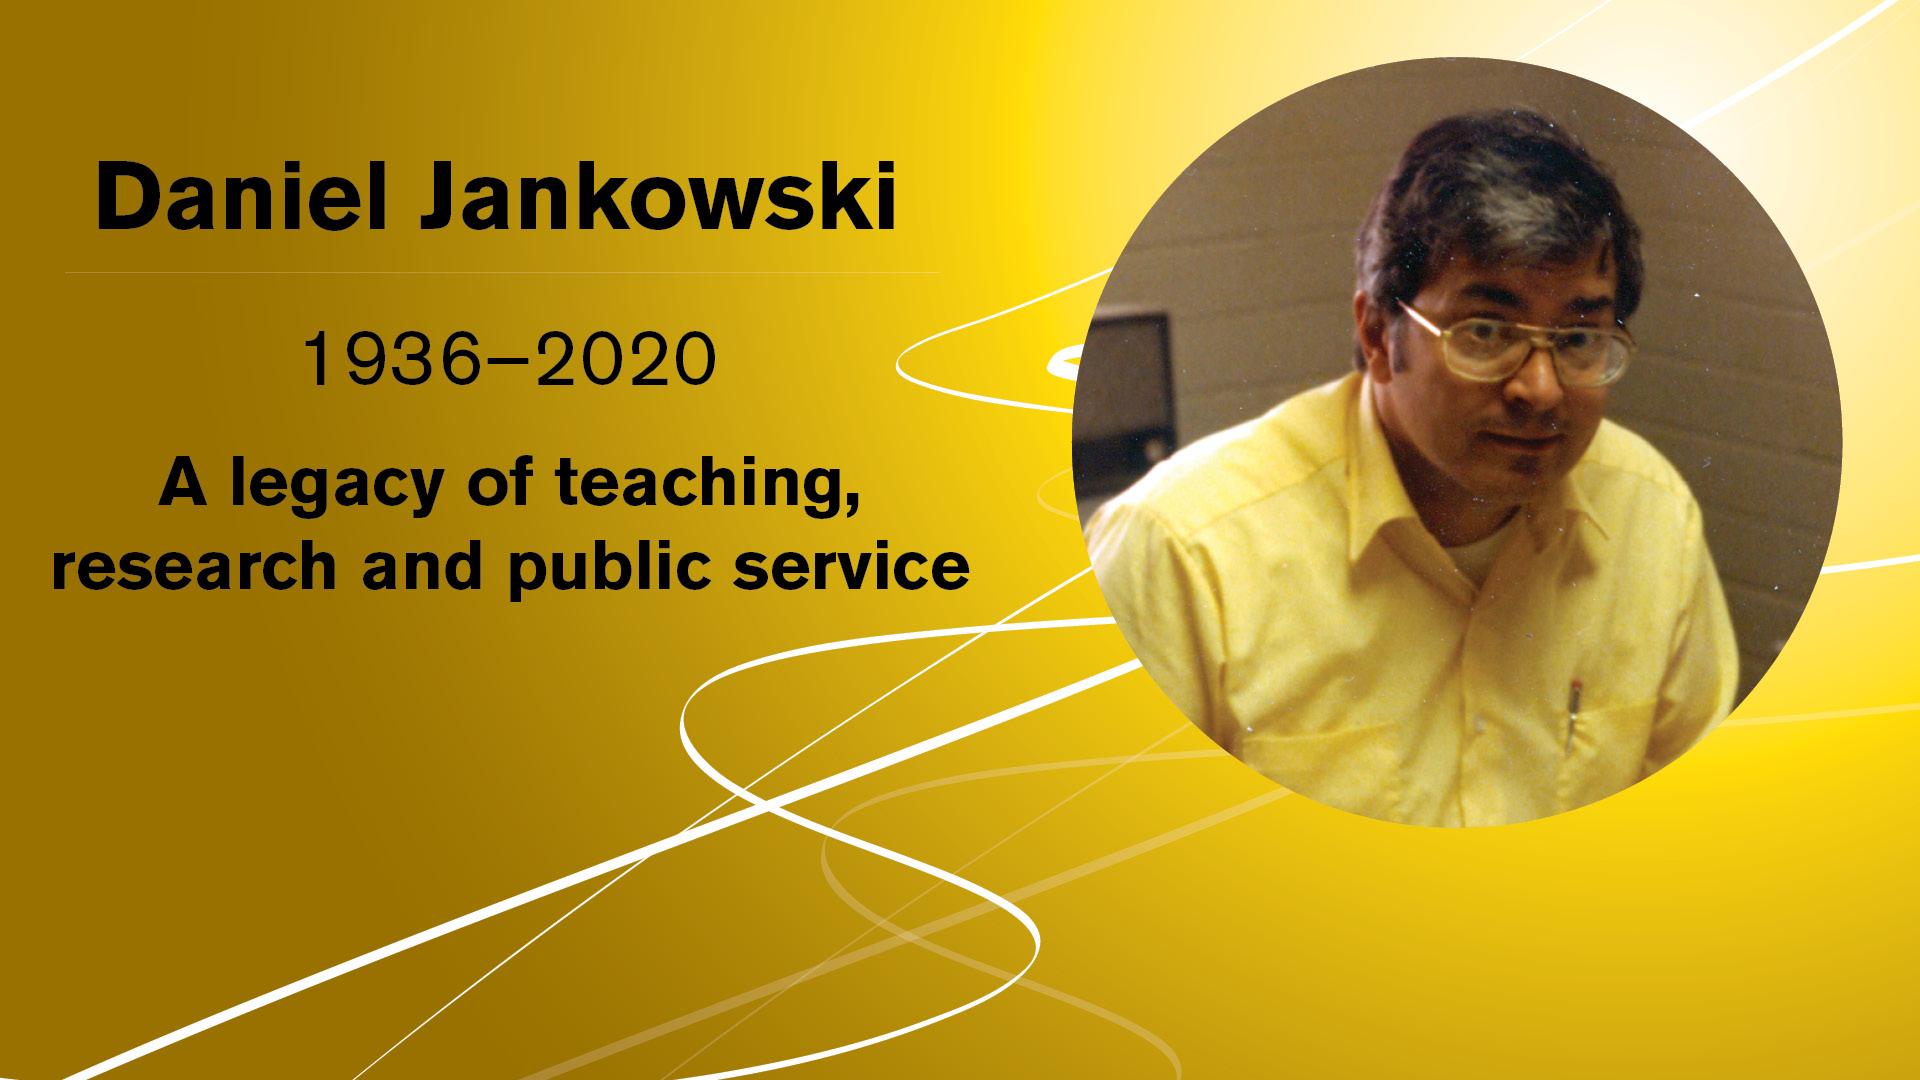 graphic with a photo of Daniel Jankowski